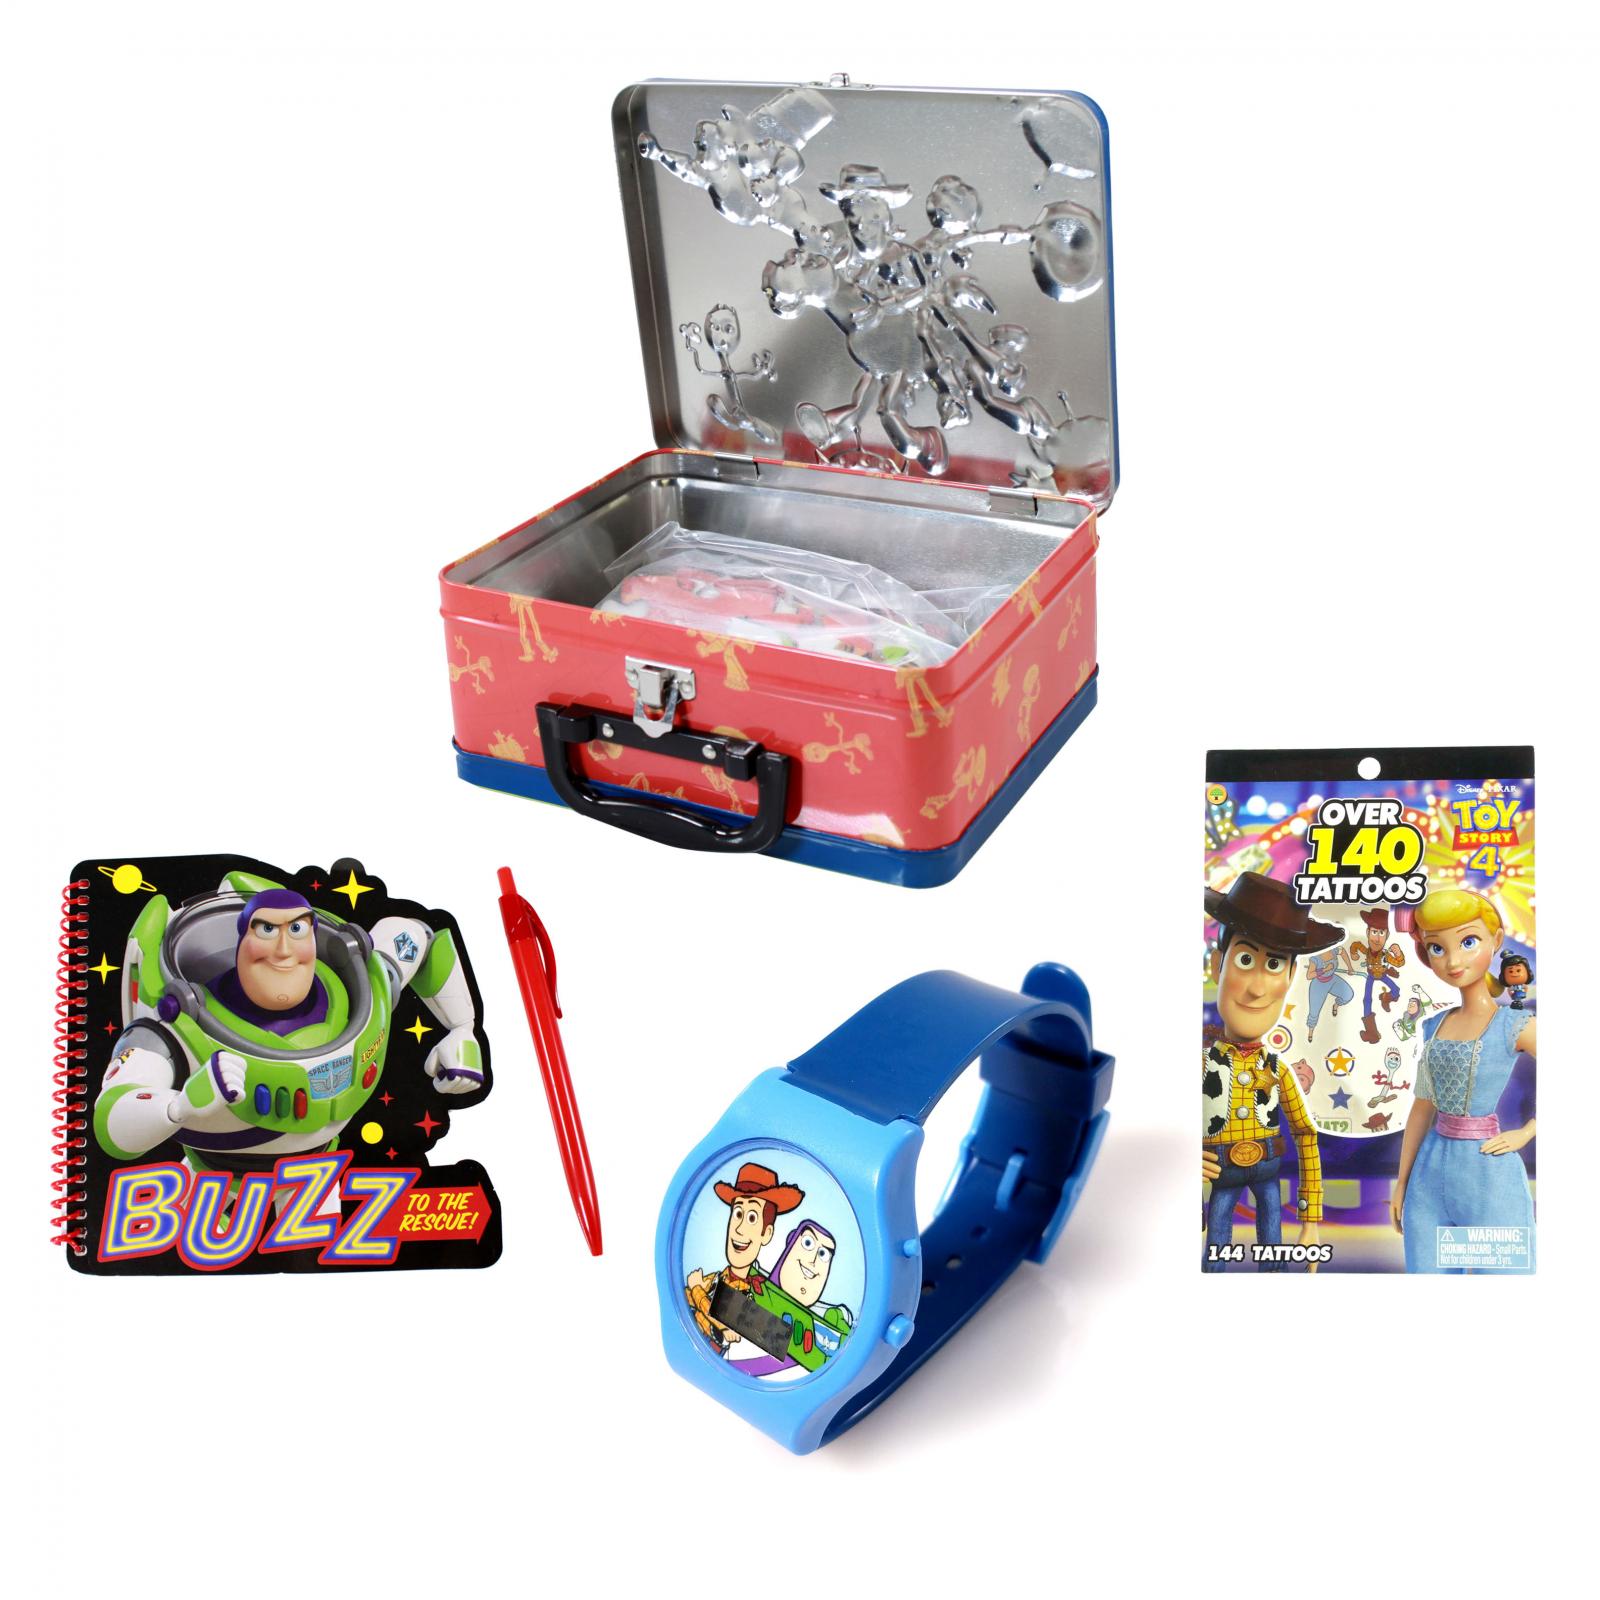 Toy Story 4 Puzzle Tin Lunch Box Bundle 6 Piece Set